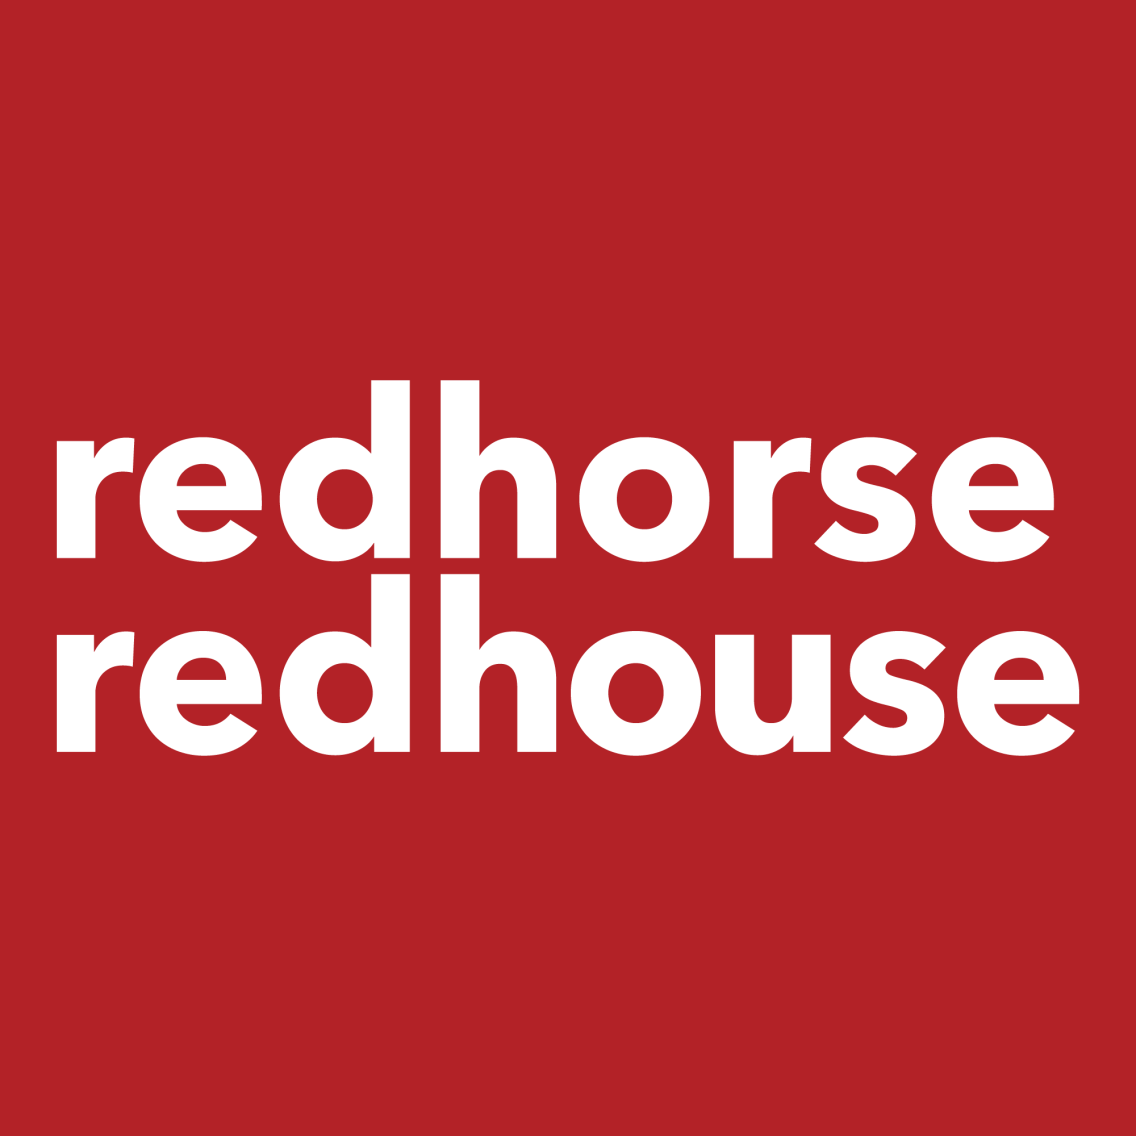 jason-b-graham-redhorse-redhouse-icon